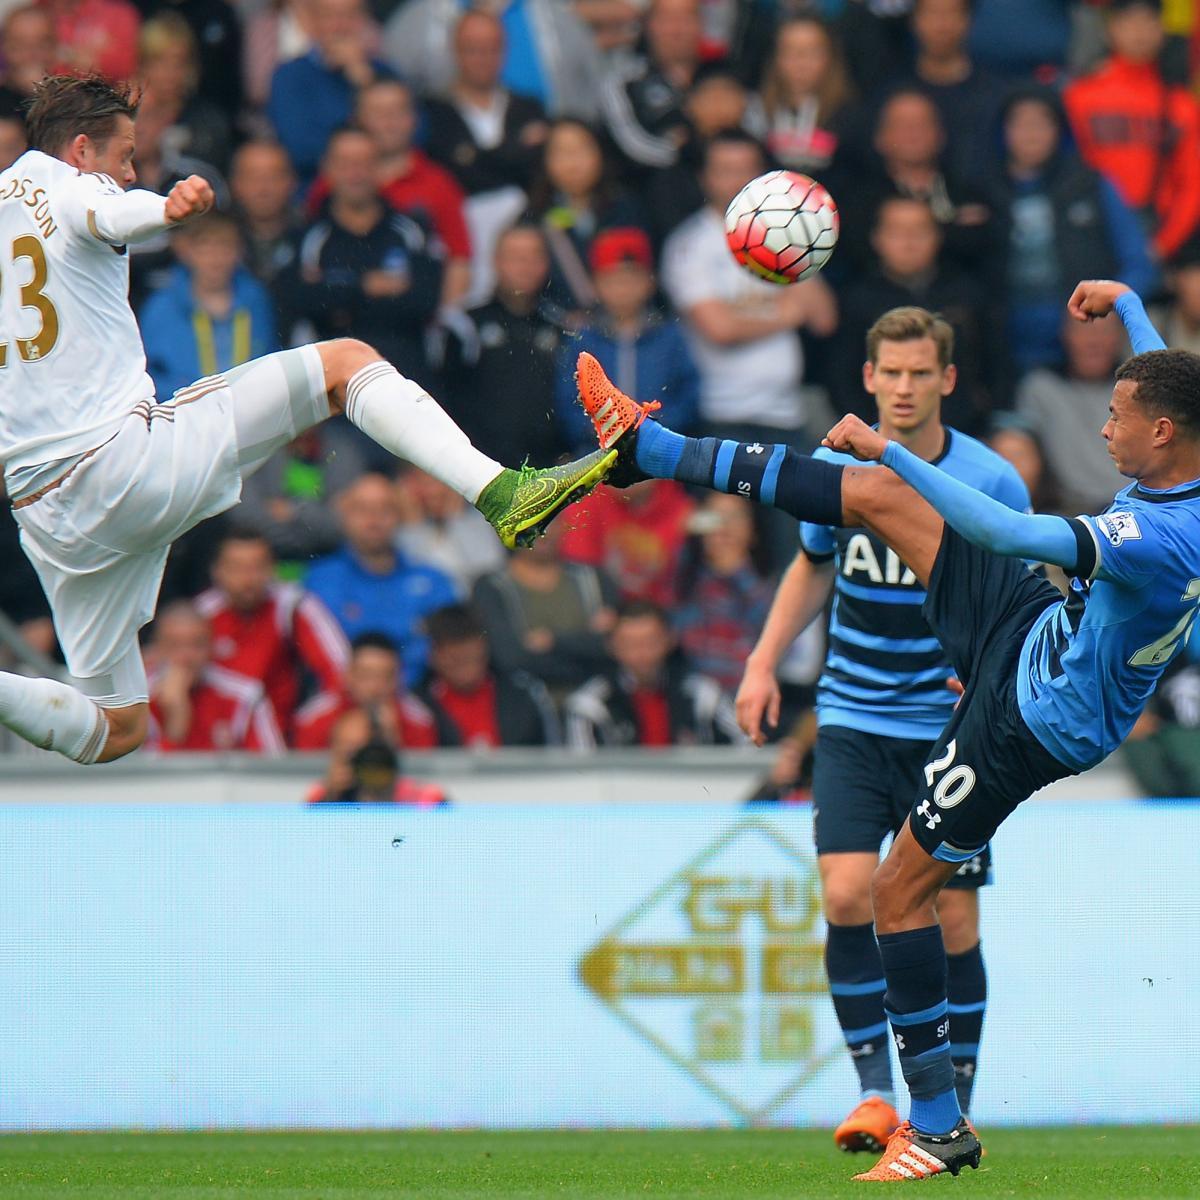 Tottenham Hotspur Vs Man United Tickets: Tottenham Vs. Swansea: Team News, Live Stream, TV Info